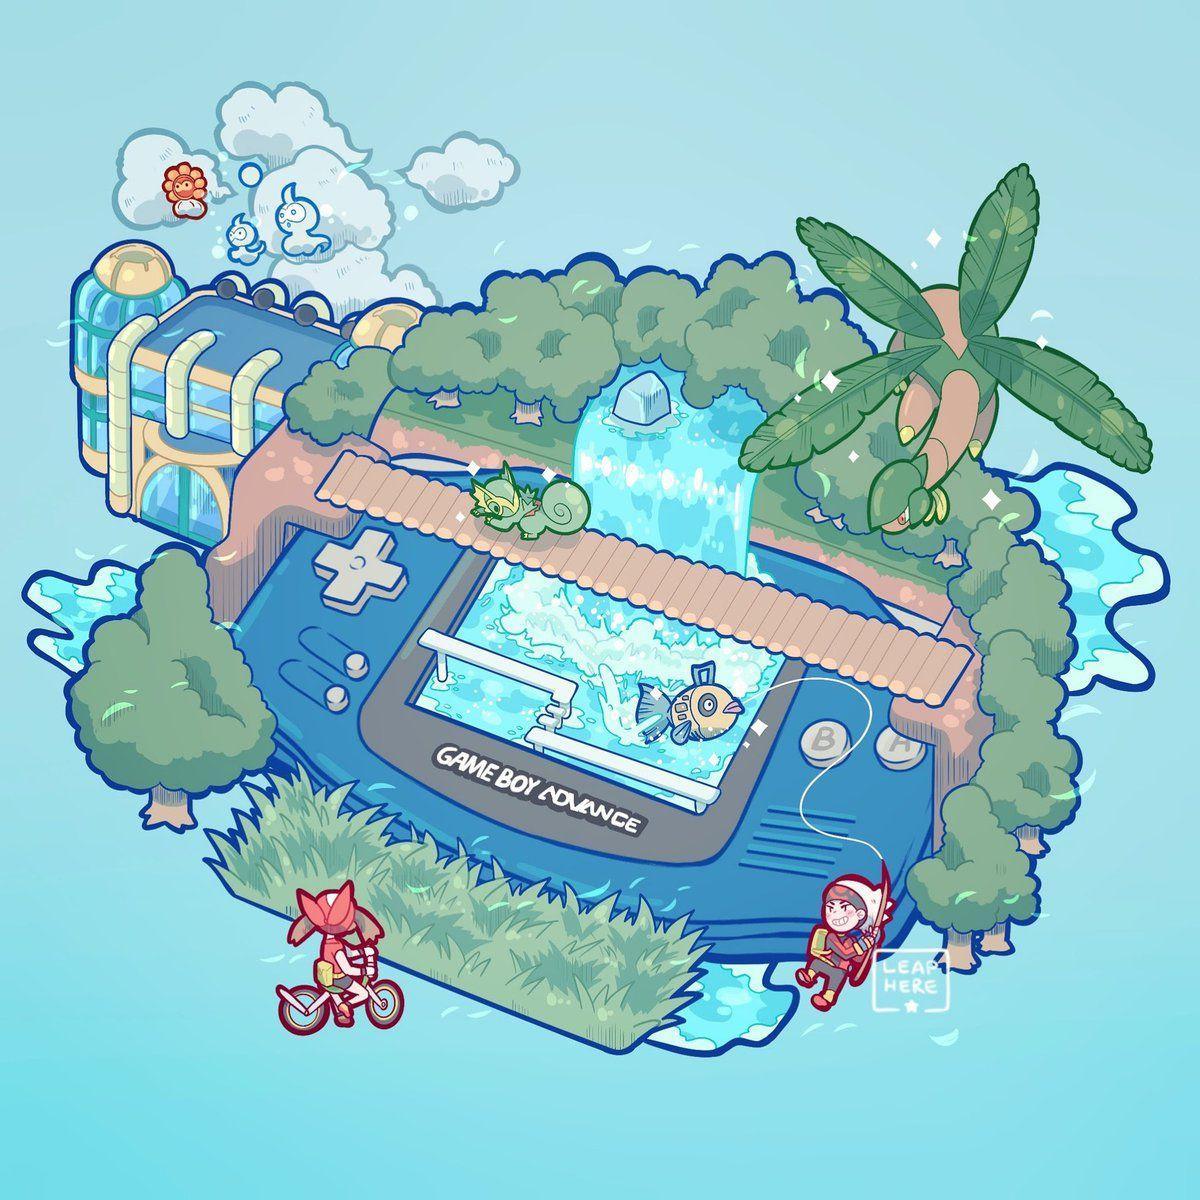 74c09a27ae7dc7586589e0c49b2685d1 - How Do I Get To Sky Pillar In Pokemon Emerald